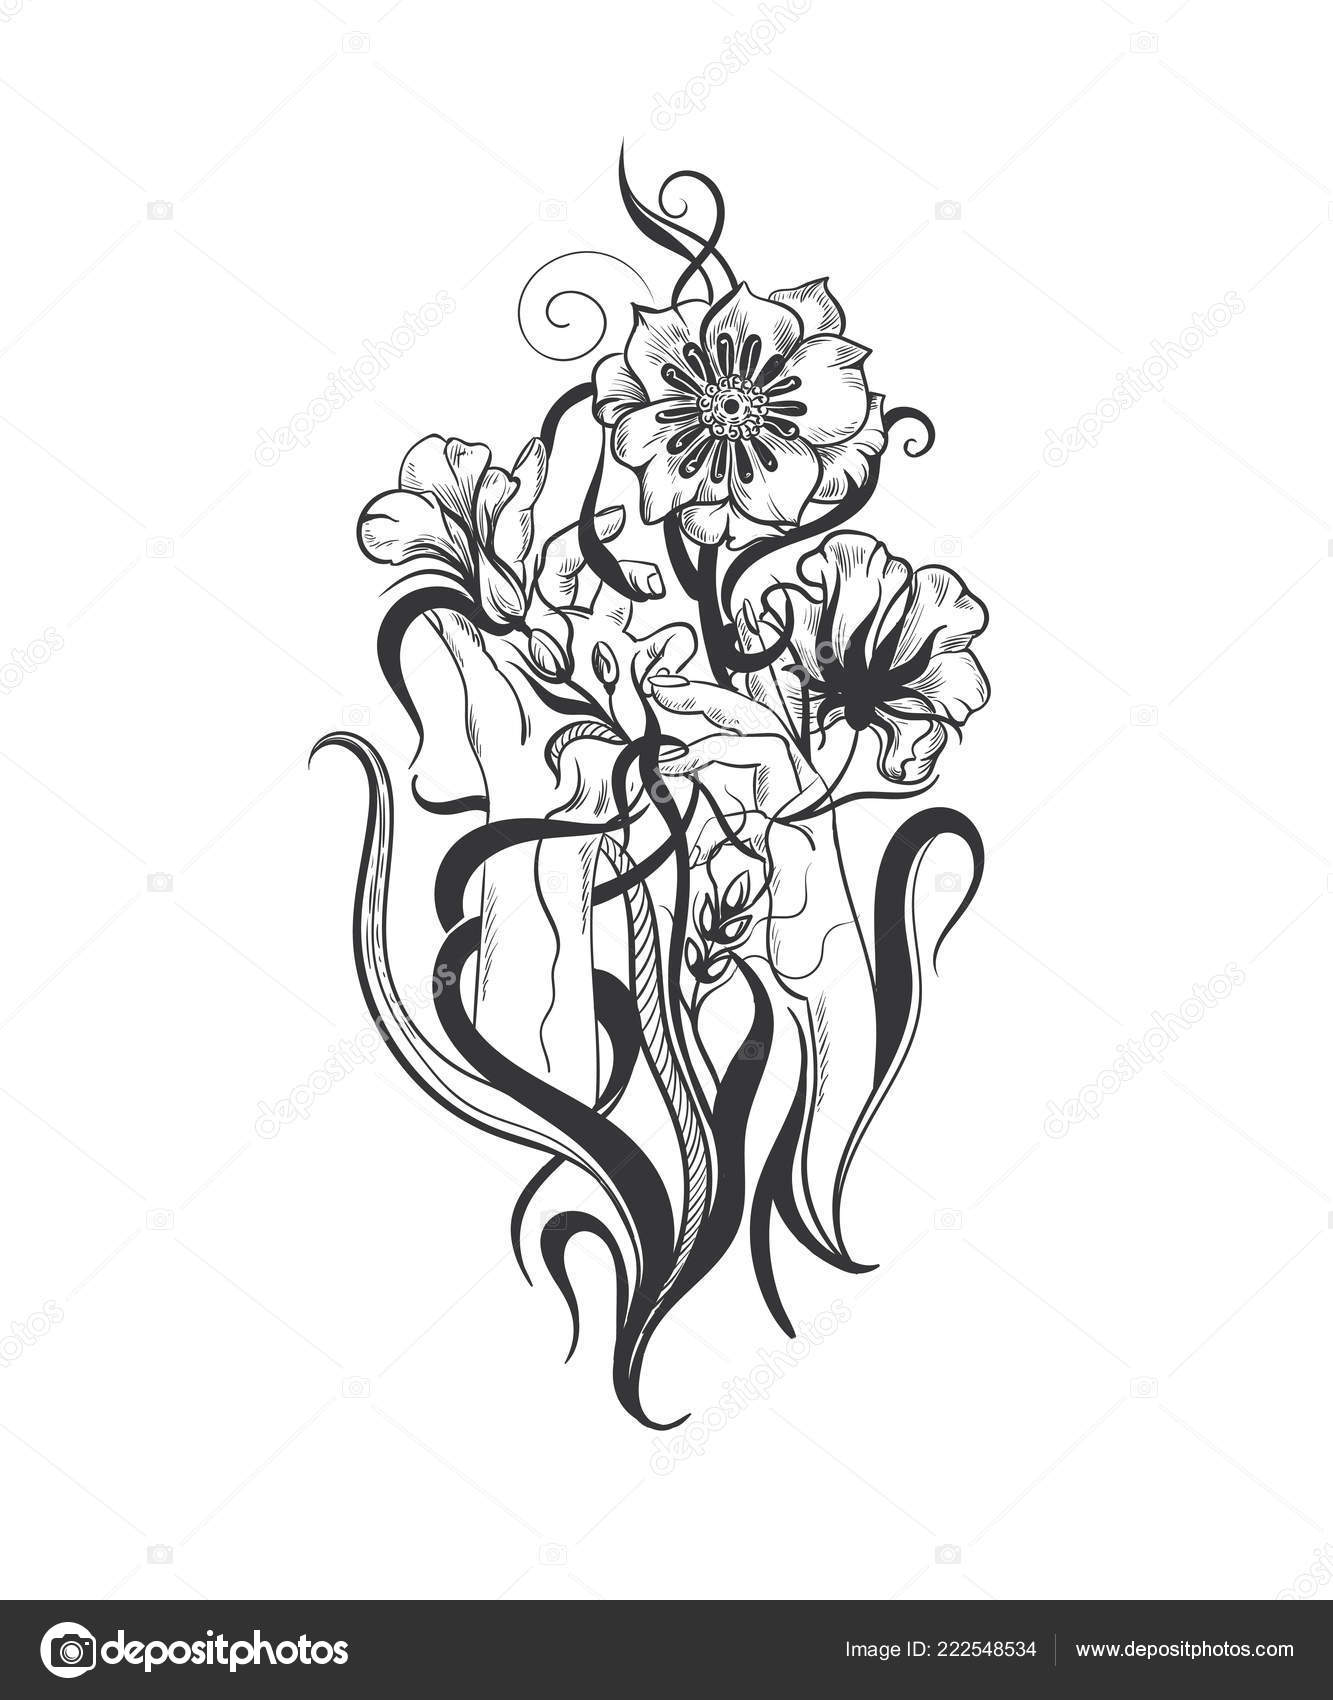 Vektor Ruce Kvetiny Kresleni Stock Vektor C Tatianat 222548534